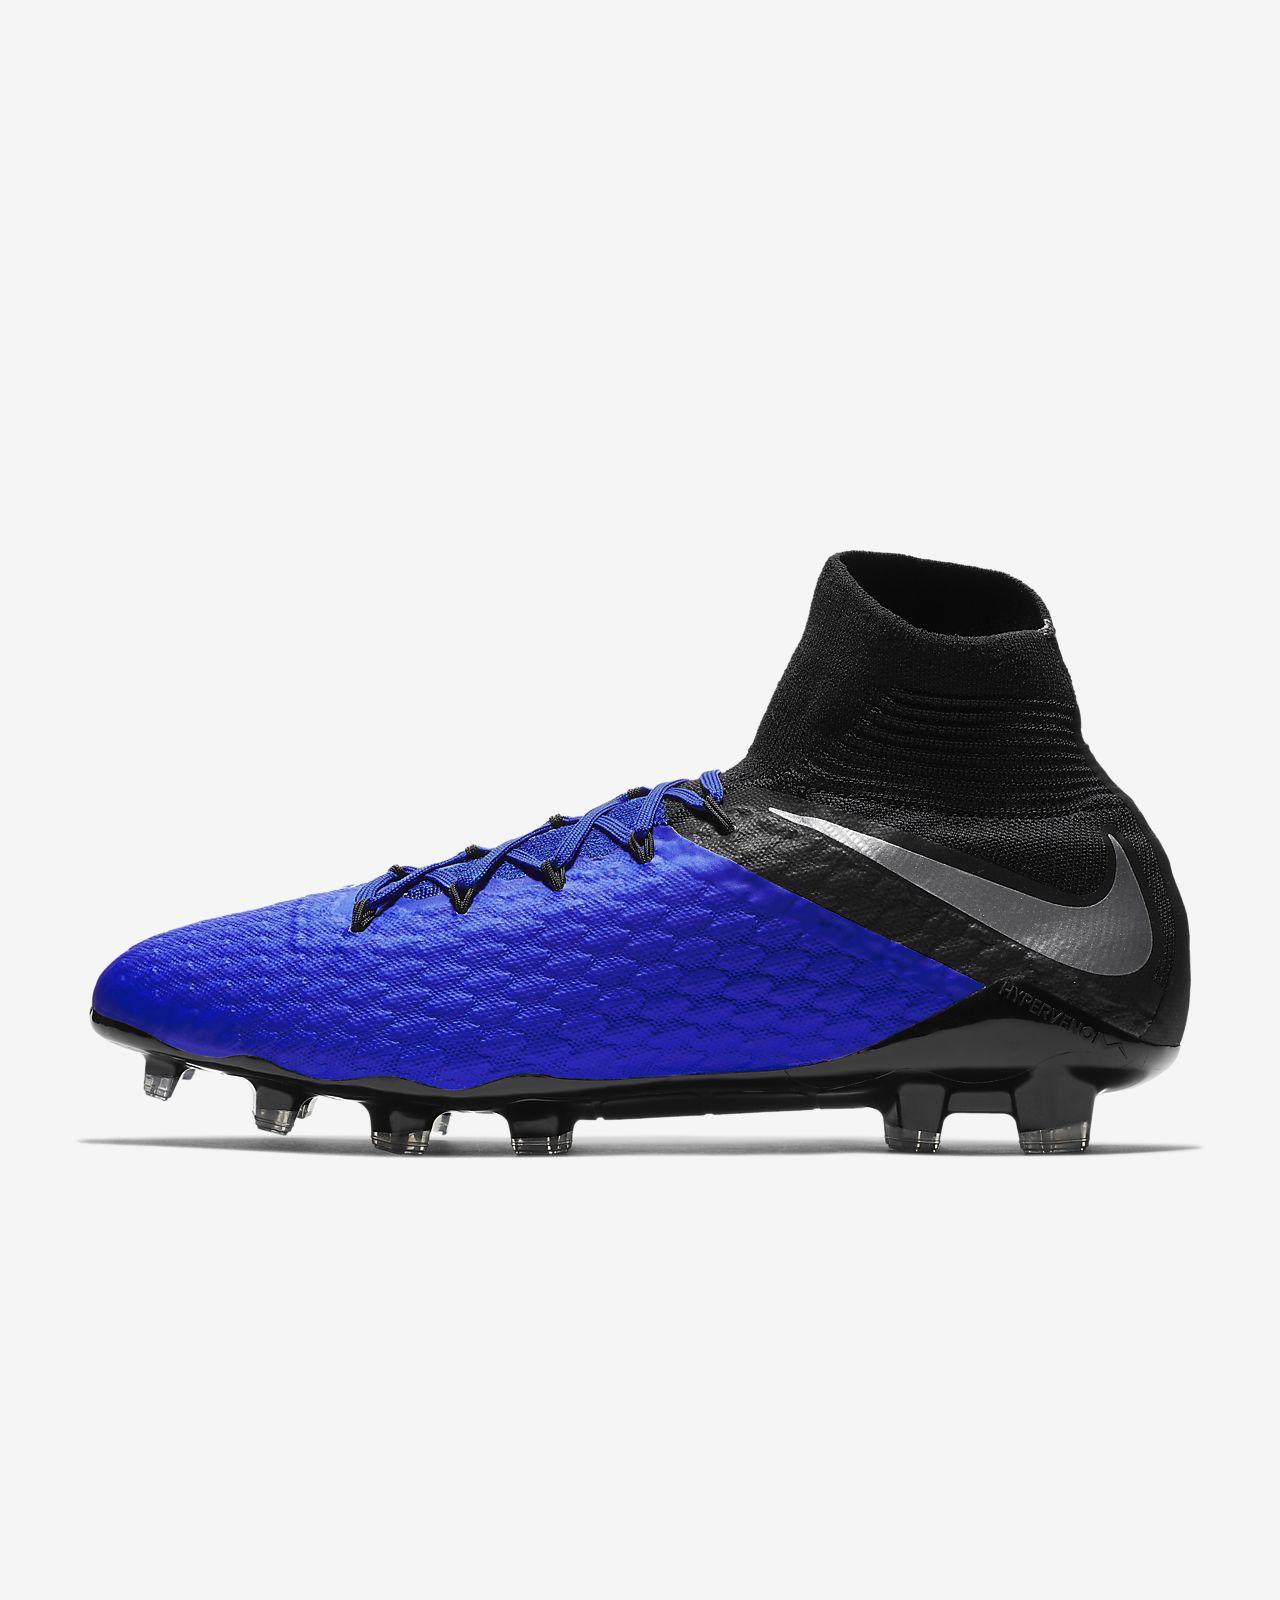 Nike Hypervenom III Pro Dynamic Fit Firm-Ground Soccer Cleat